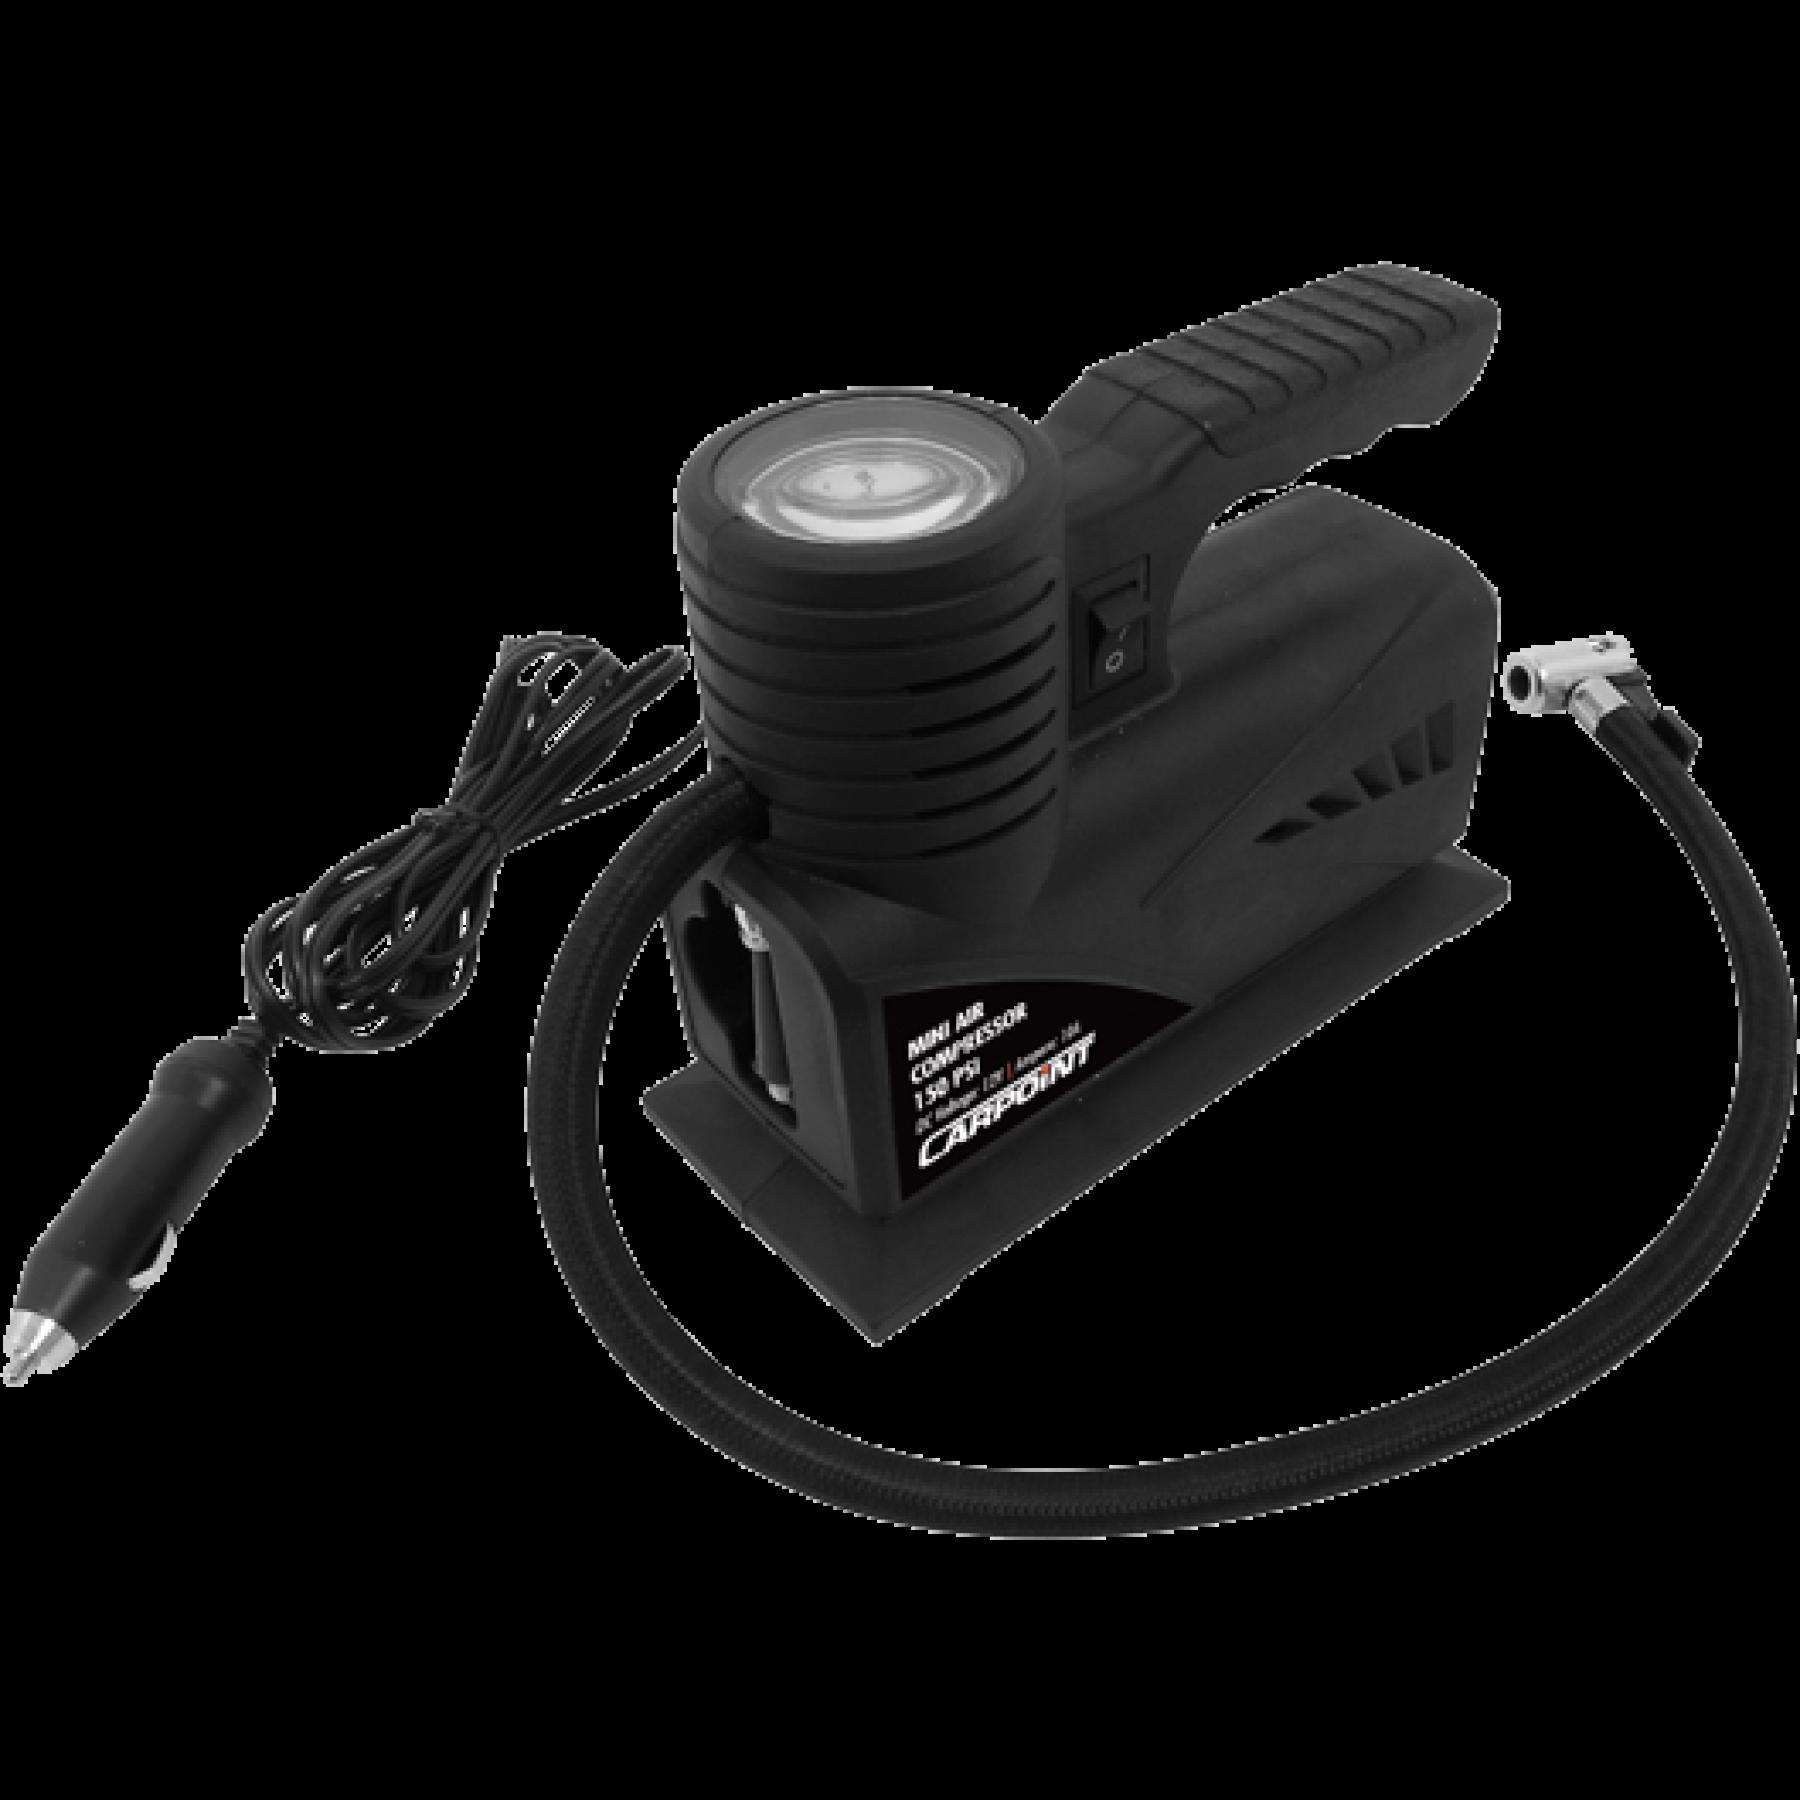 Compressor 12v analoog